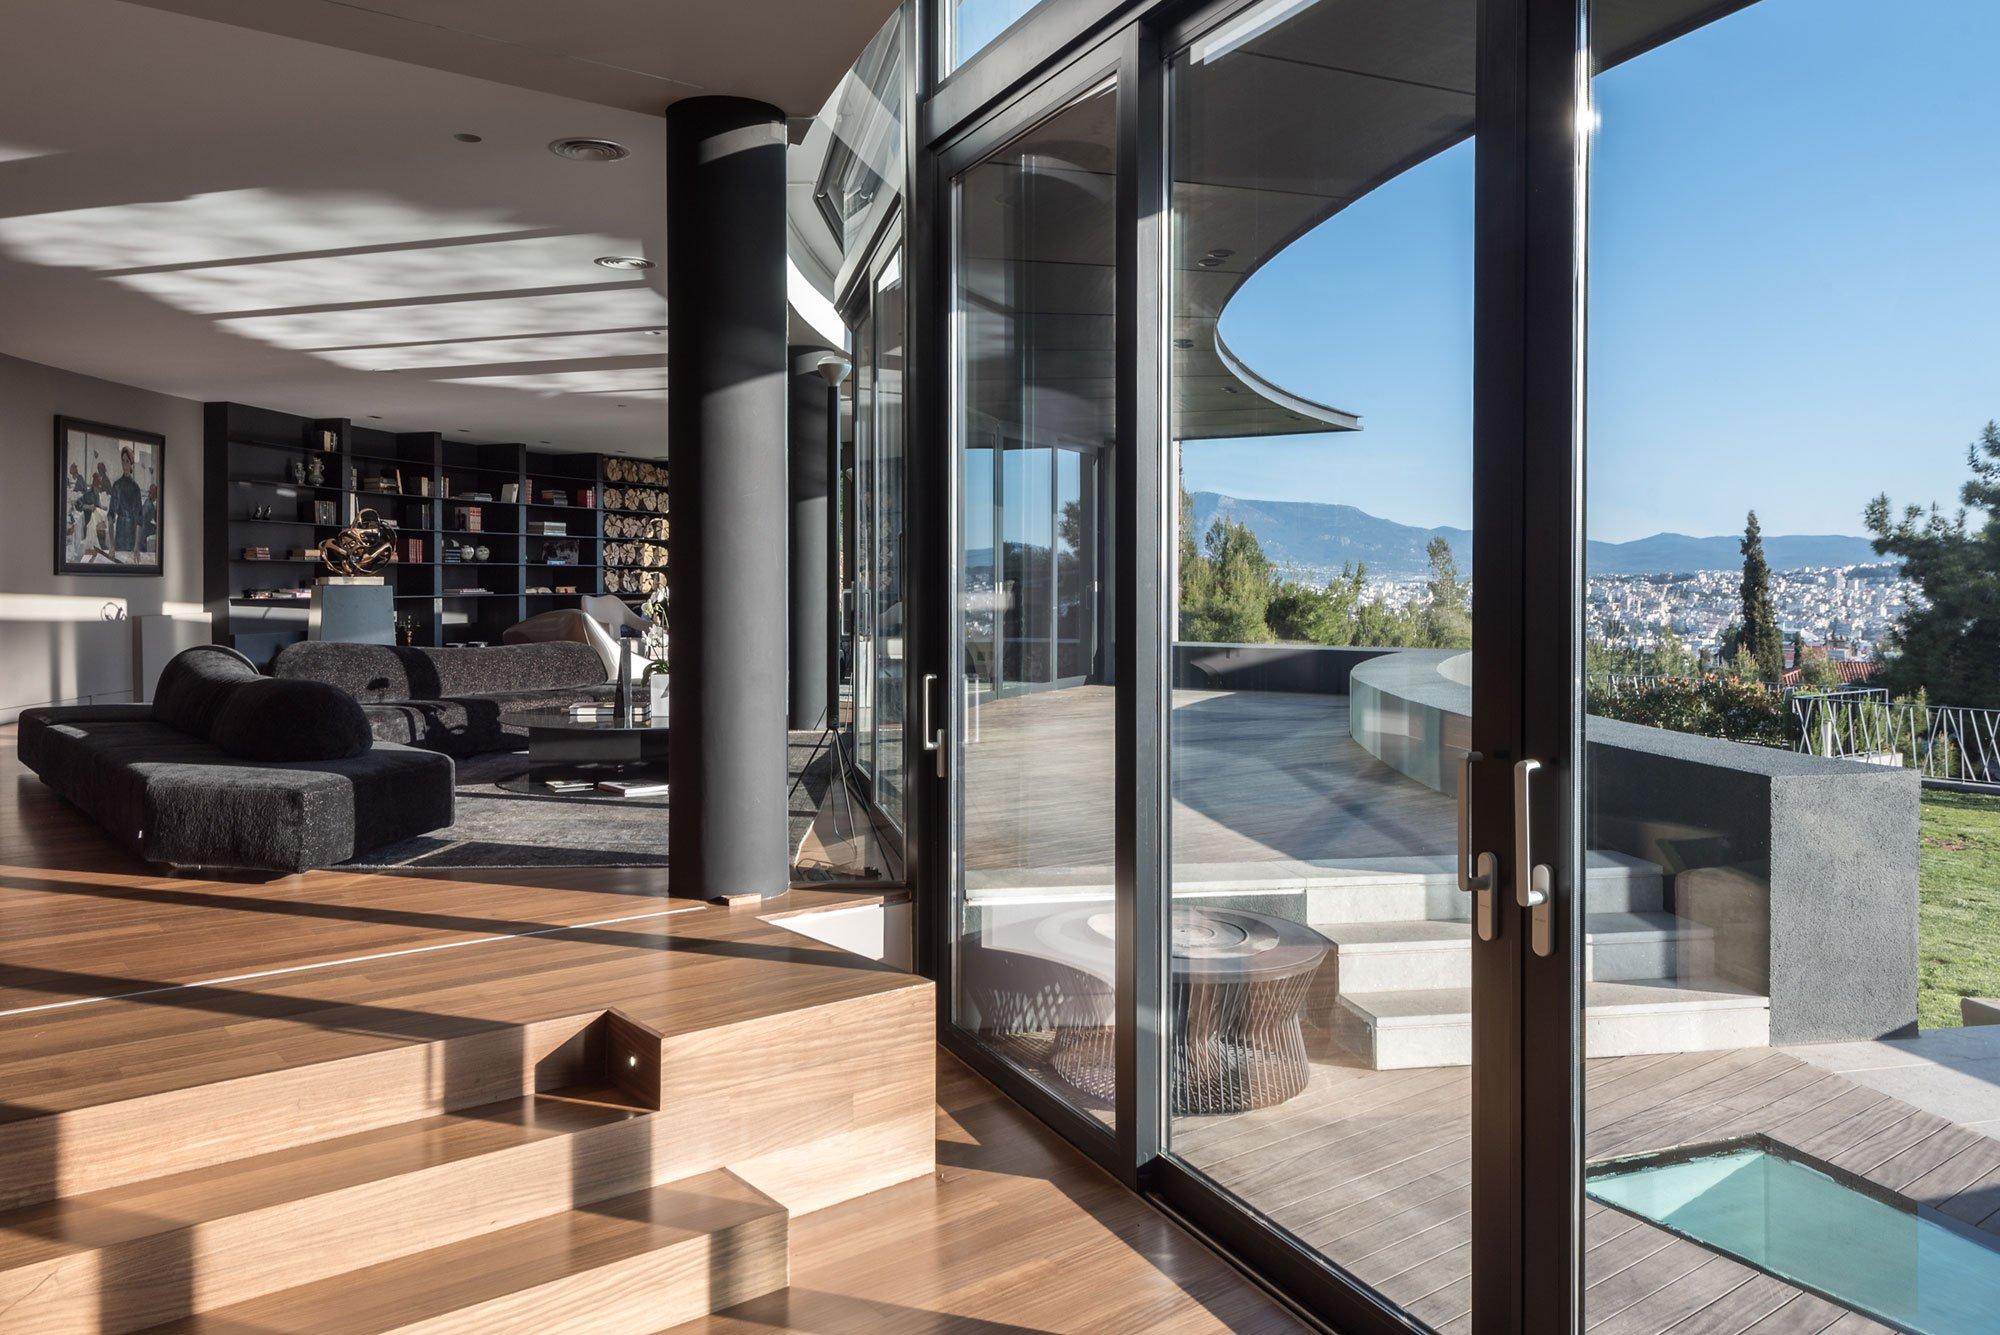 The Edge House by Studio Omerta